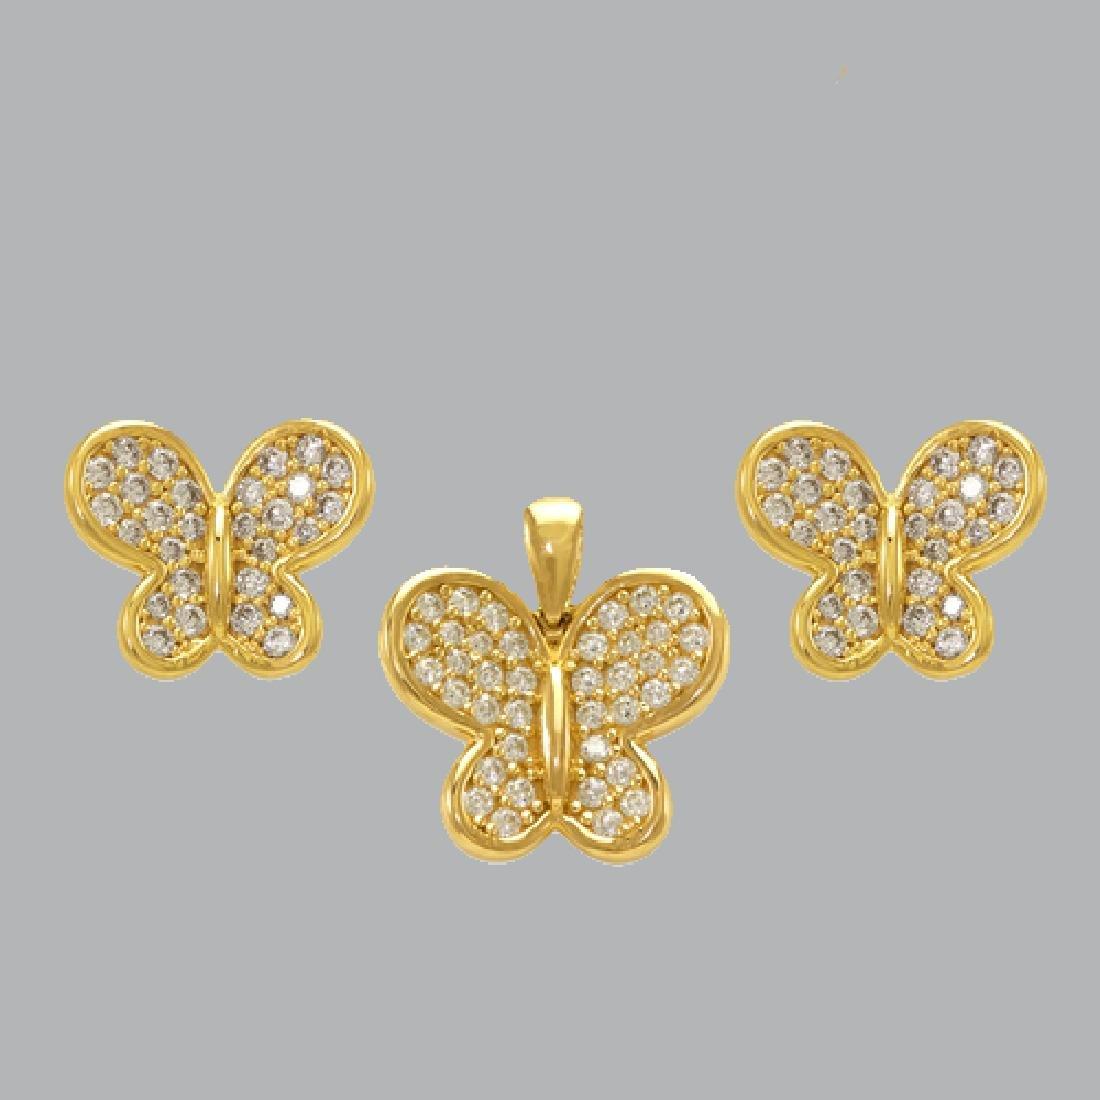 NEW 14K YELLOW GOLD BUTTERFLY EARRING PENDANT SET